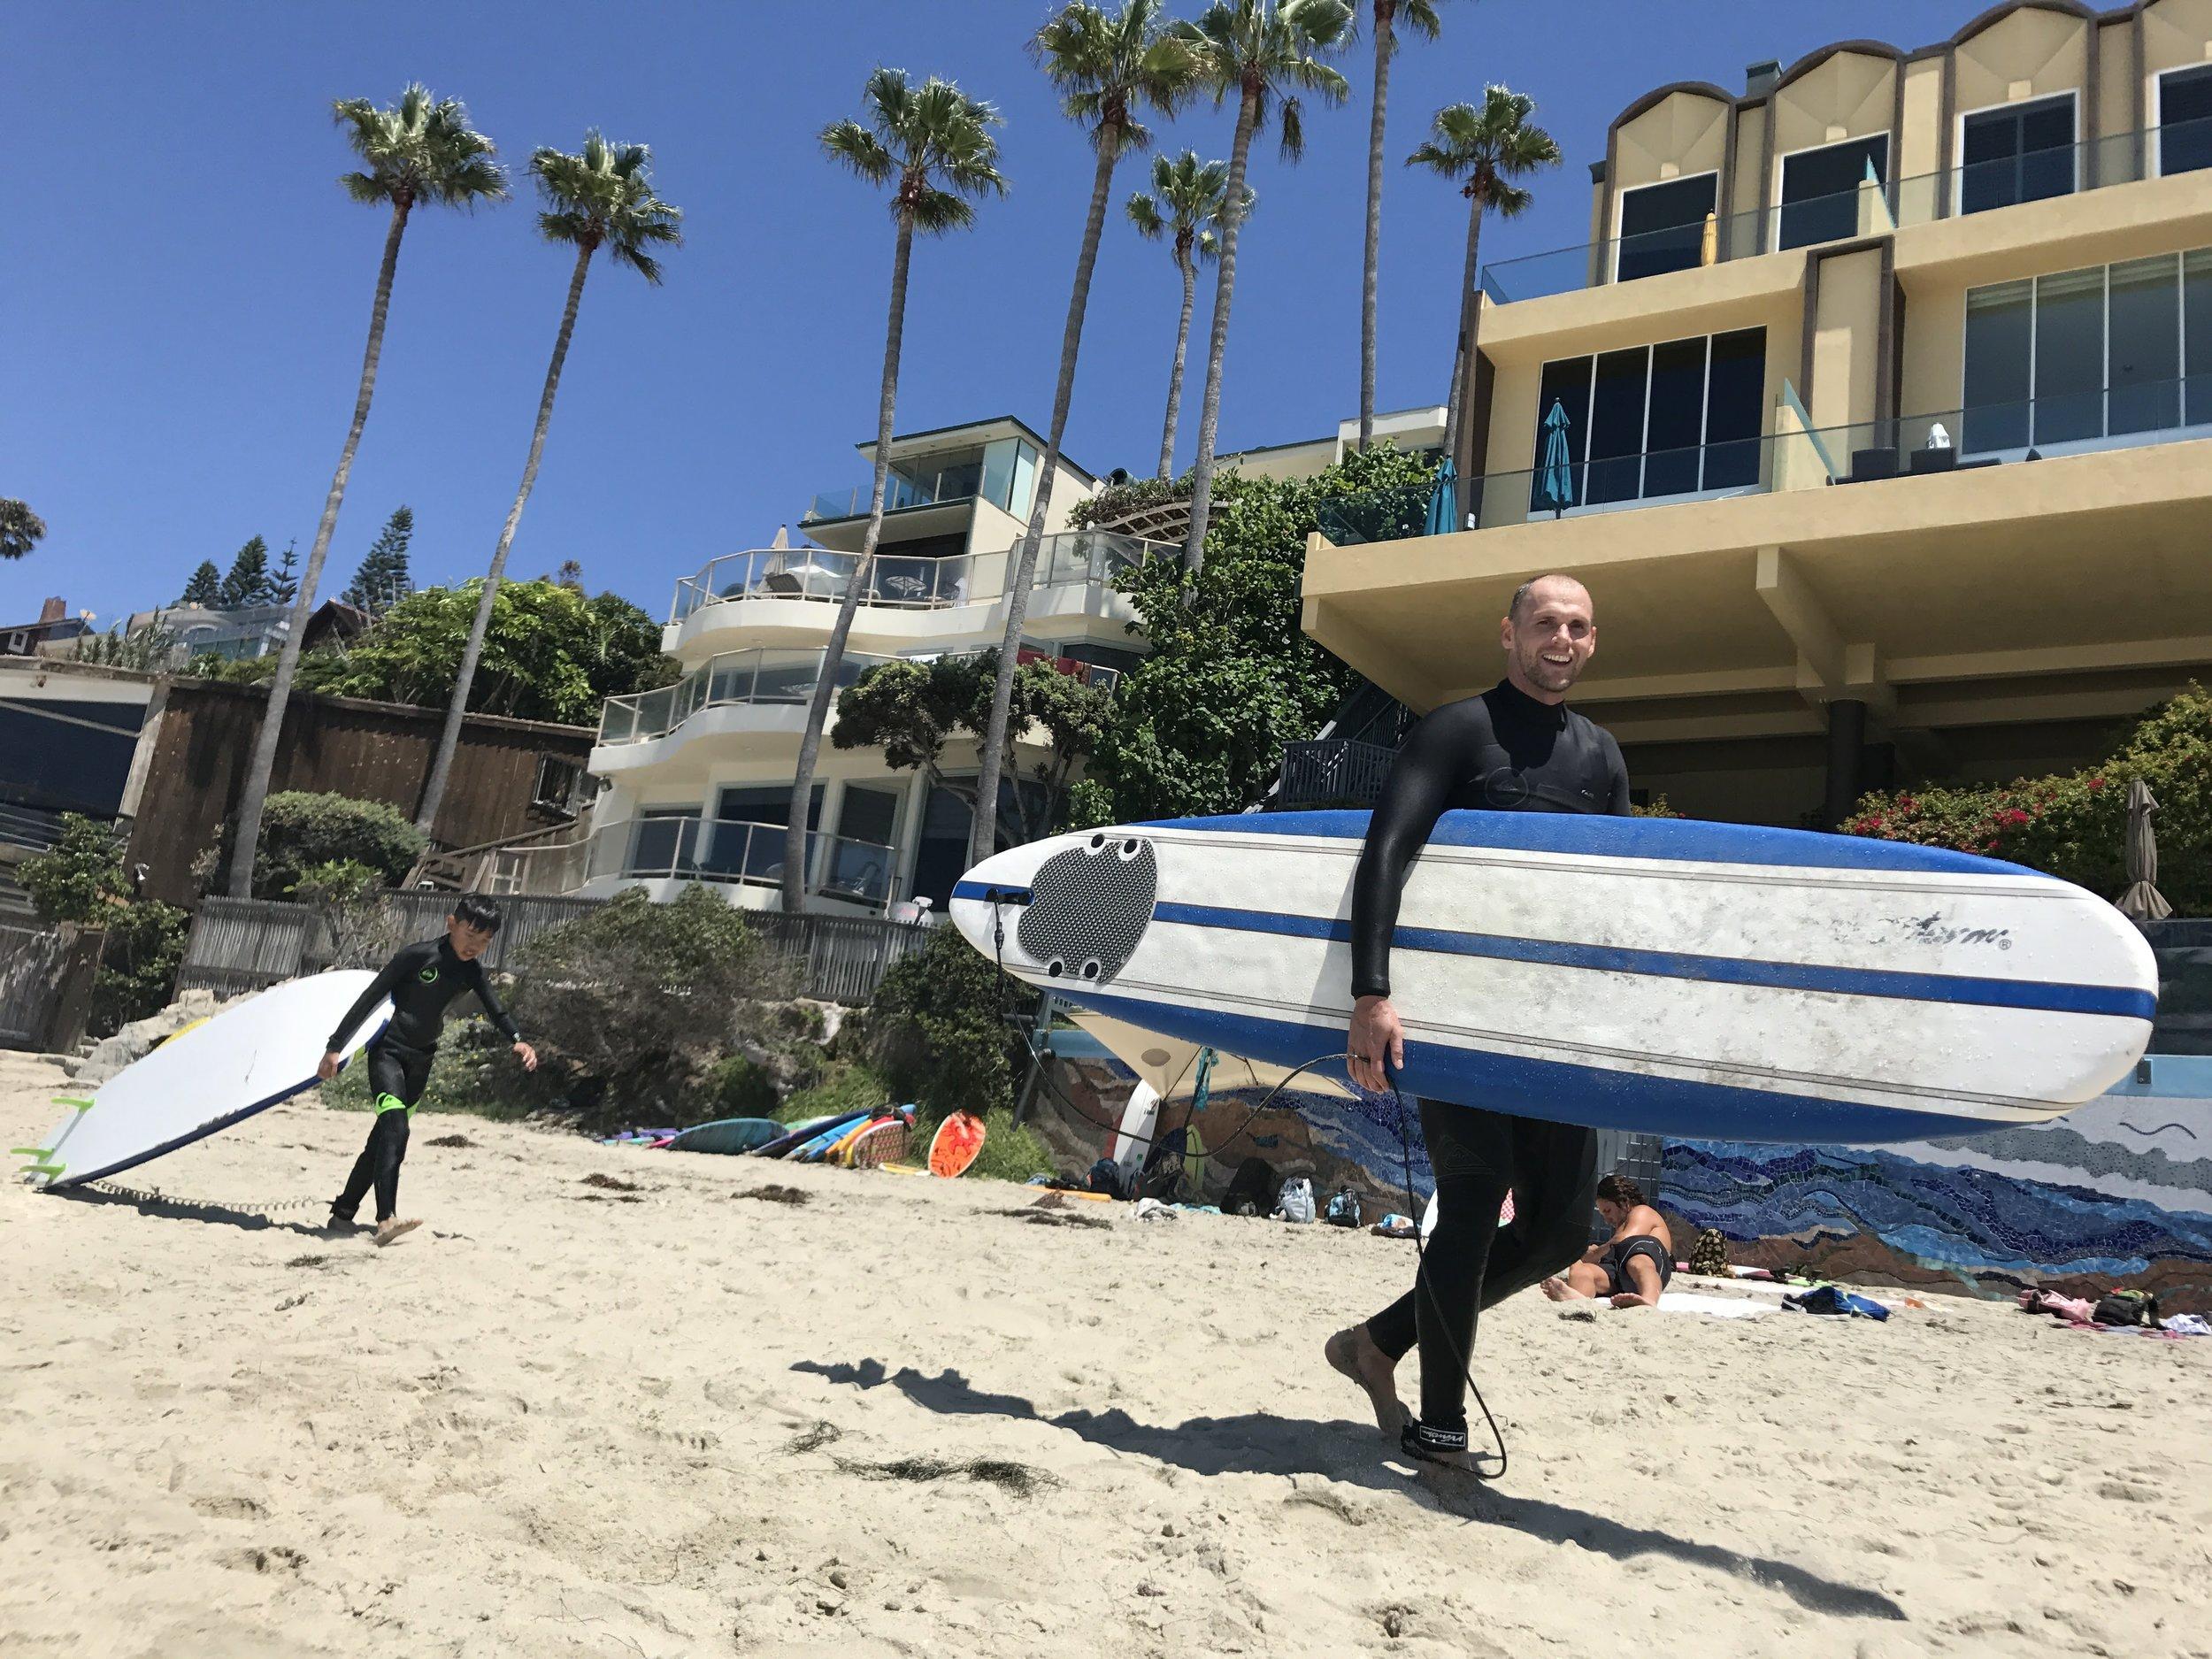 Surfing Laguna Beach Surf Lessons